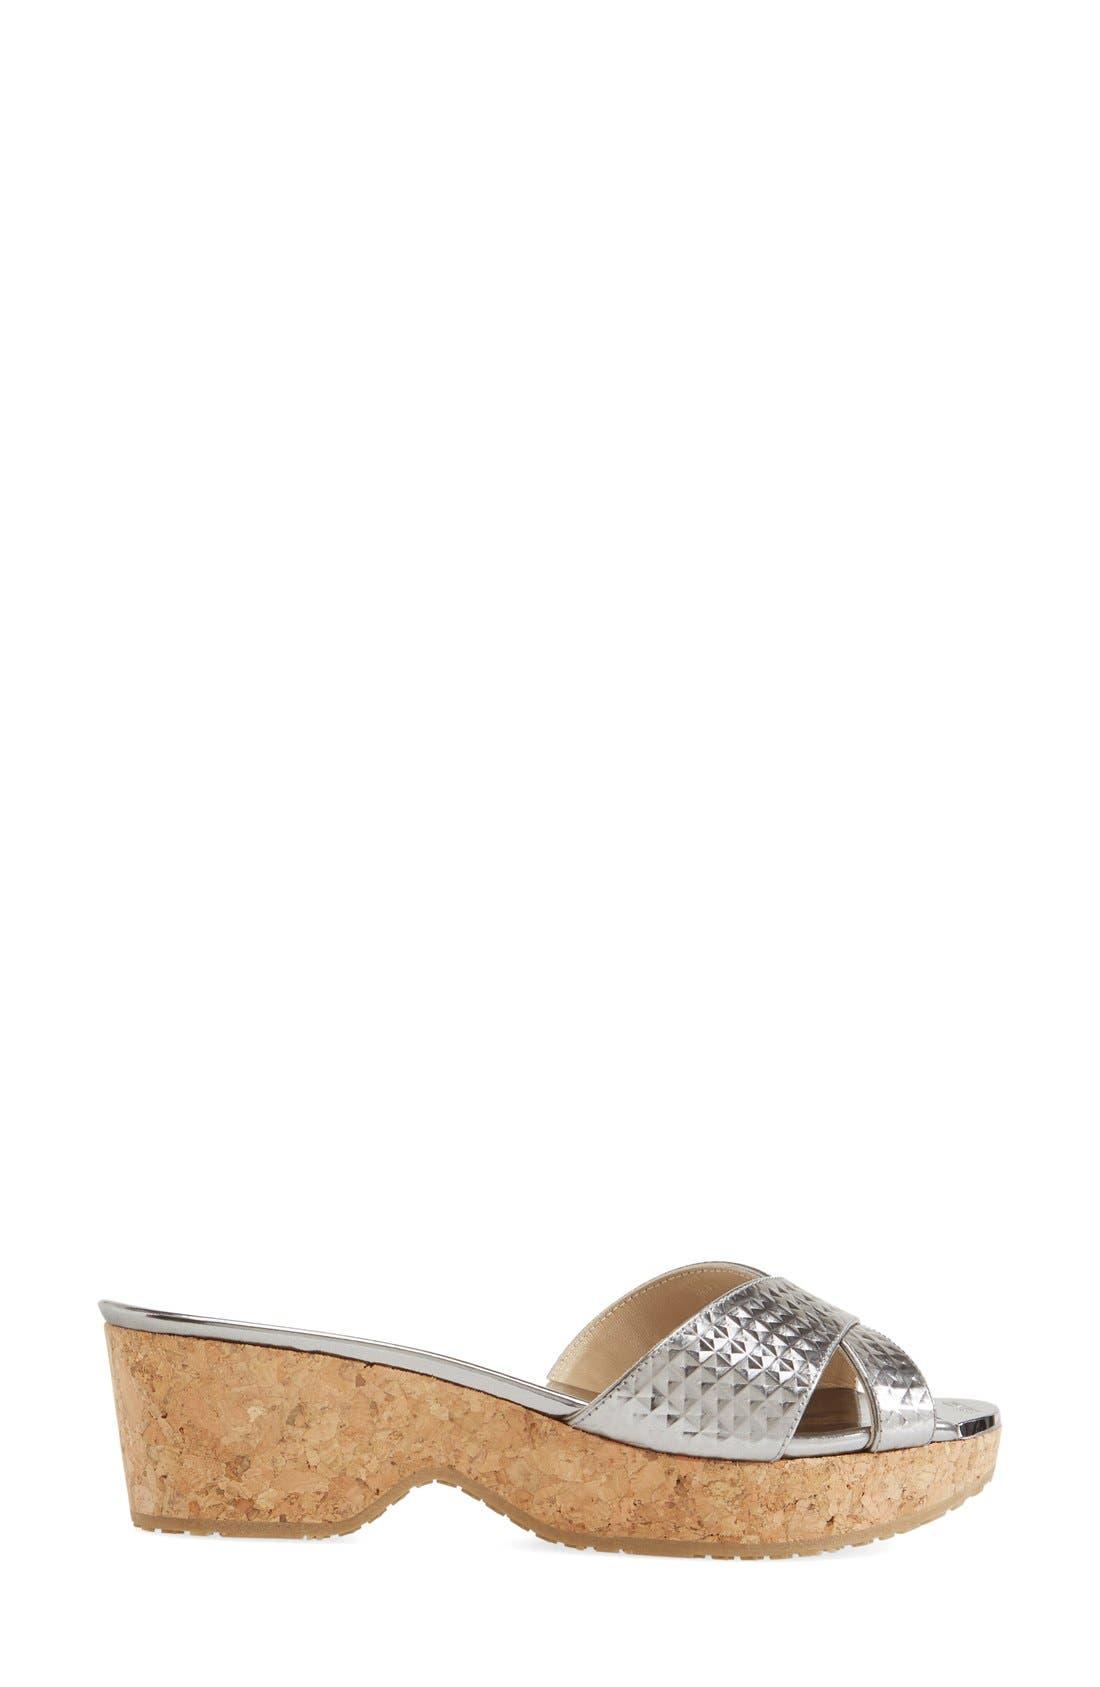 'Panna' Cork Wedge Slide Sandal,                             Alternate thumbnail 2, color,                             040